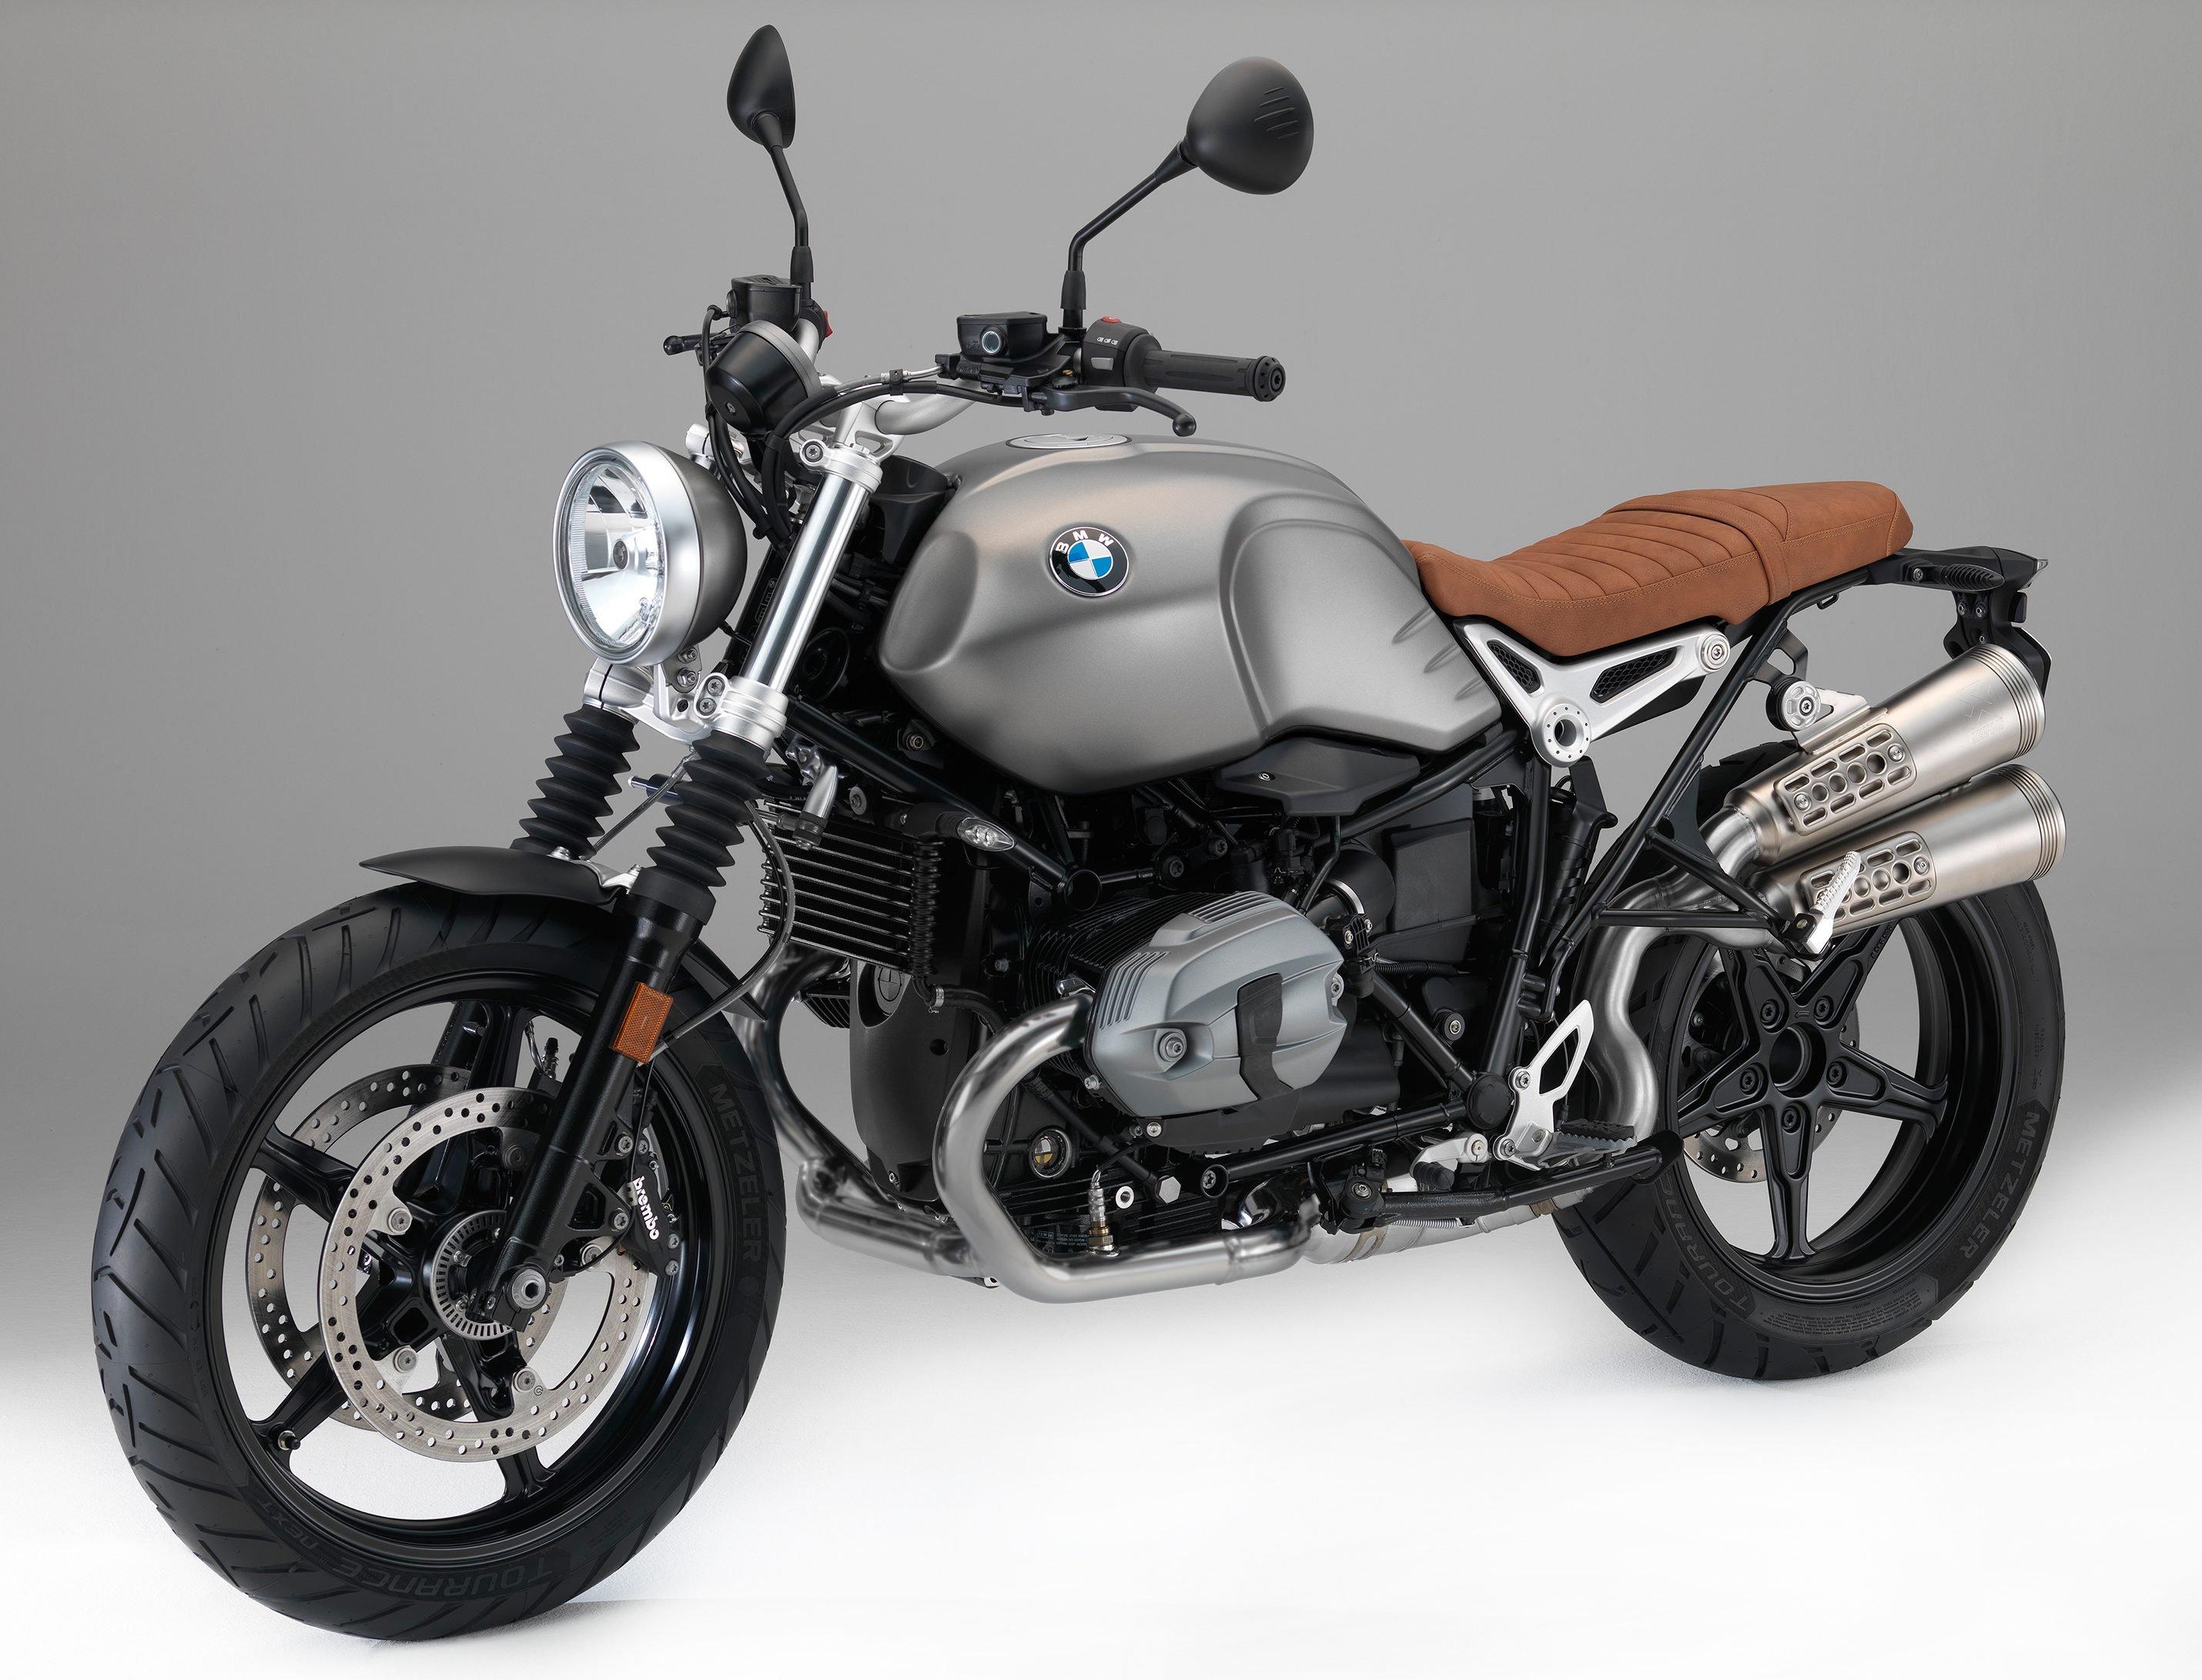 2017 BMW Motorrad R nineT Scrambler German price announced ...